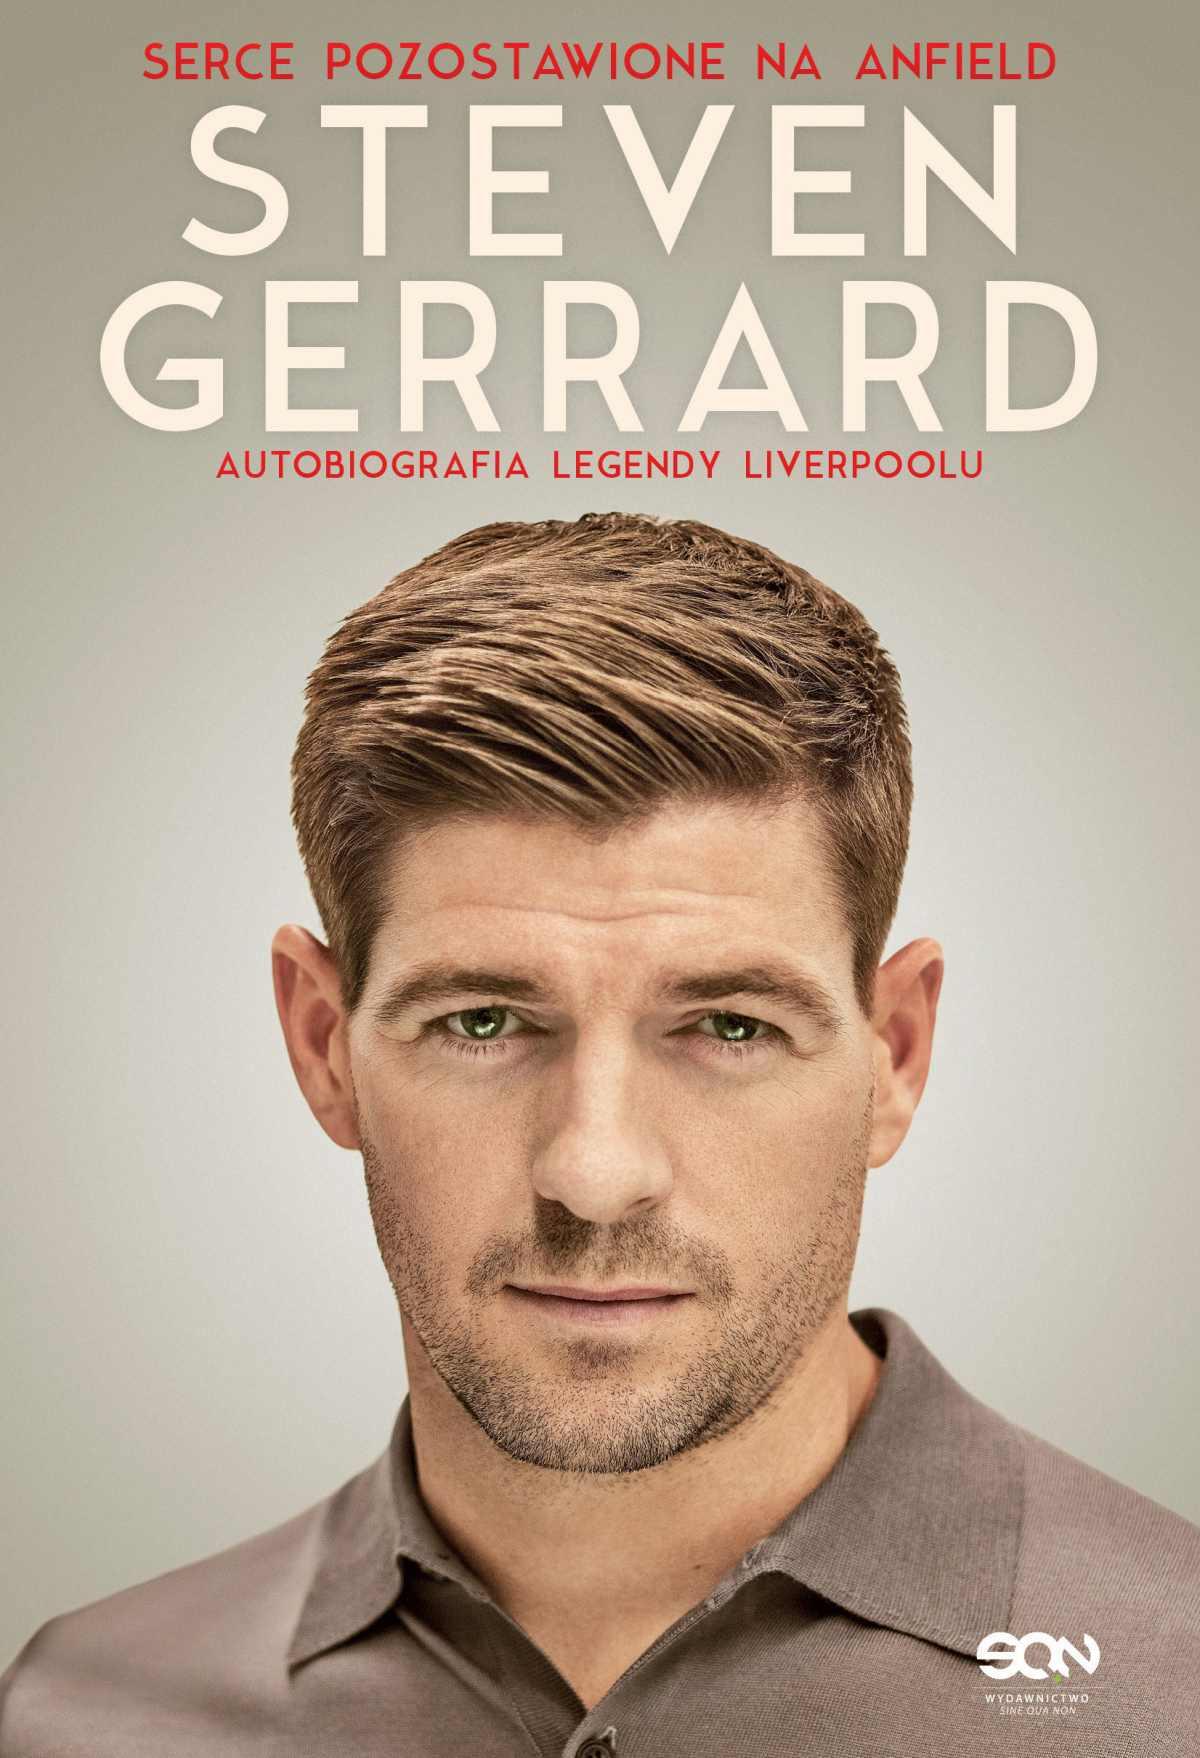 Steven Gerrard. Autobiografia legendy Liverpoolu - Ebook (Książka EPUB) do pobrania w formacie EPUB